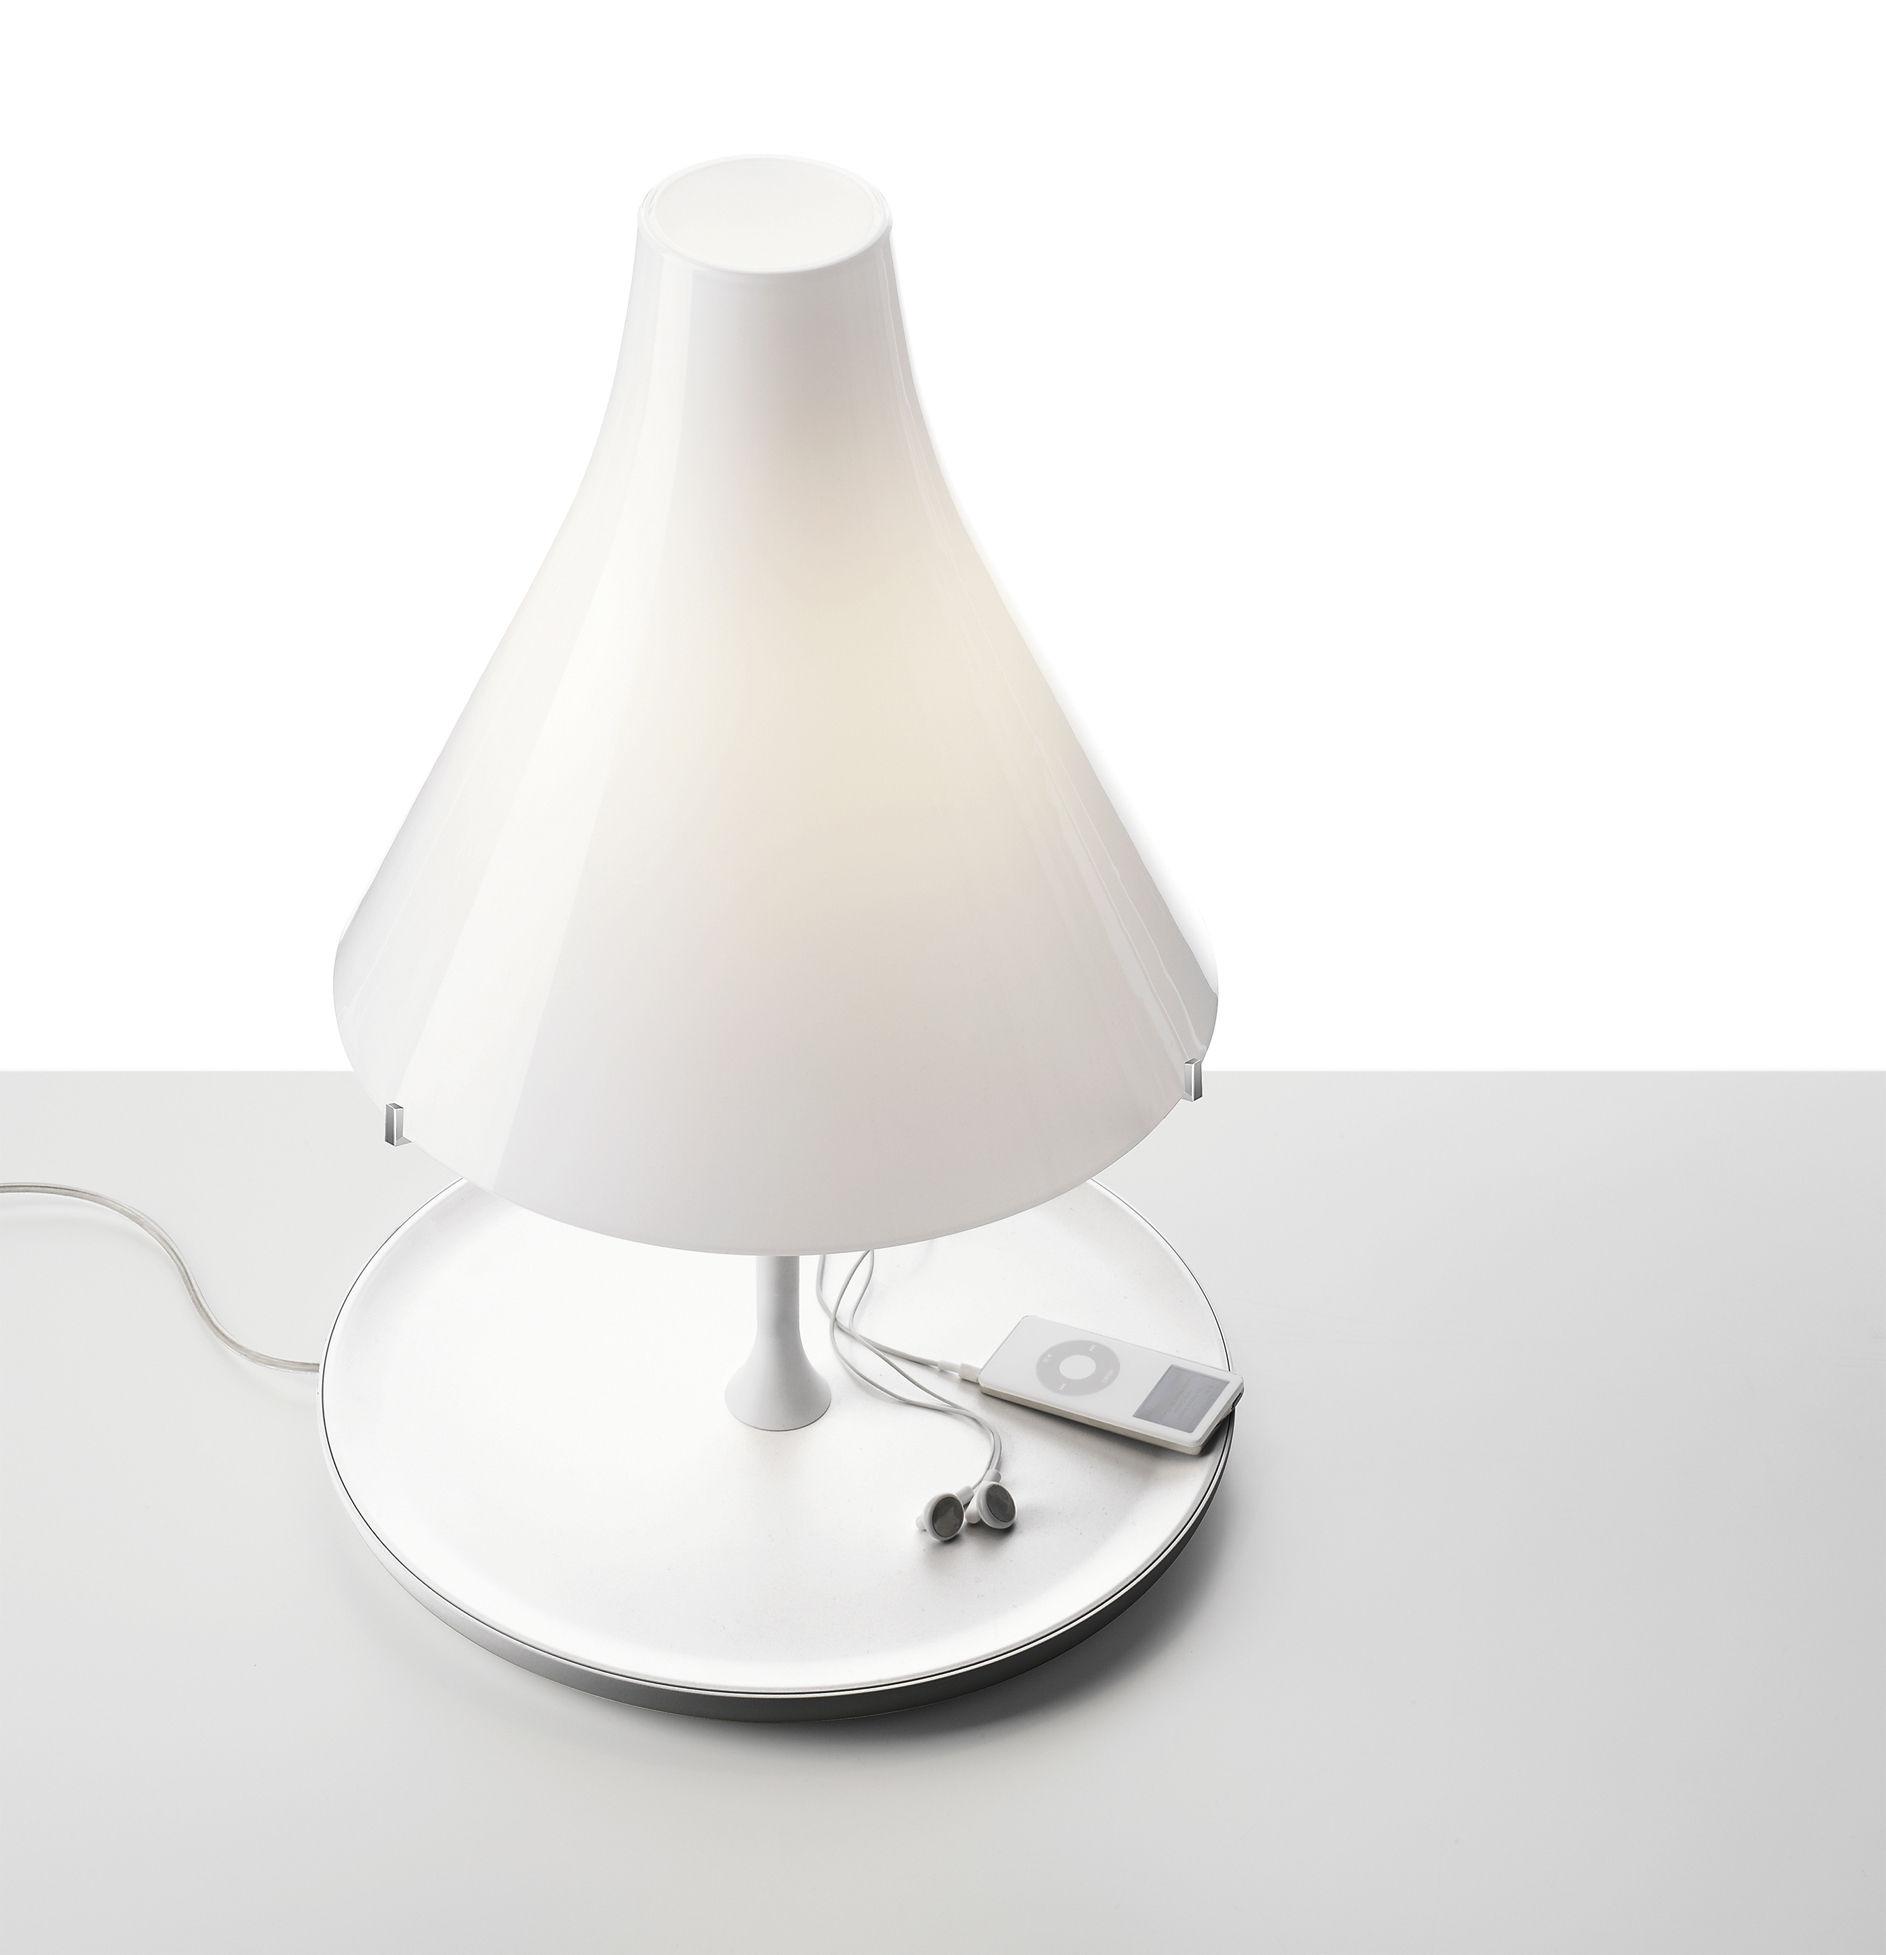 Lampada da tavolo tosca foscarini paralume ambra base in legno h 50 x 33 made in design - Base lampada da tavolo ...